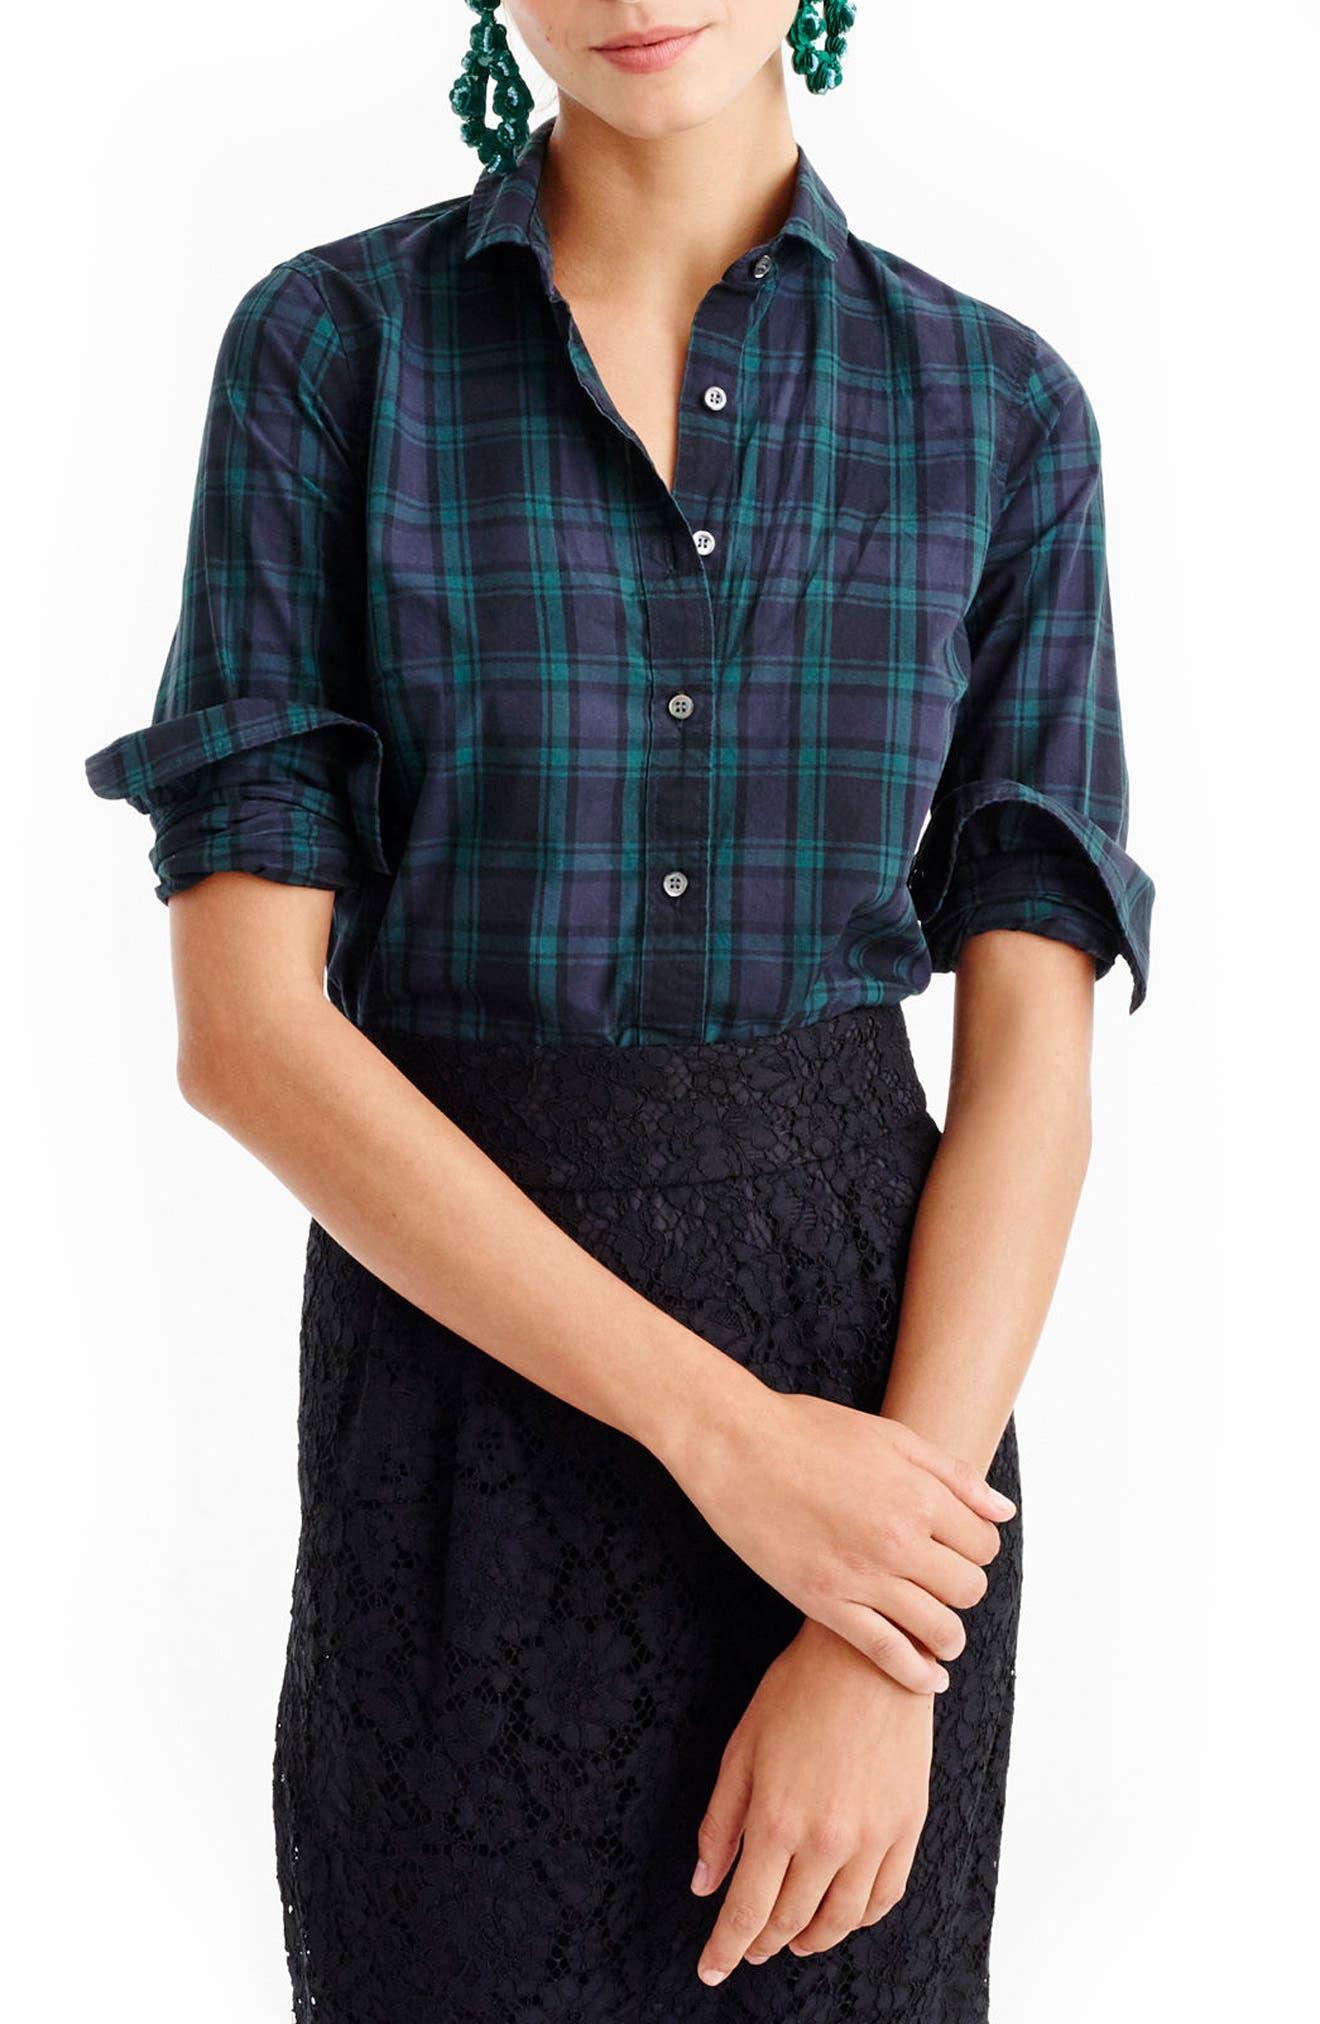 J.Crew Perfect Club Collar Black Watch Plaid Shirt (Regular & Petite)